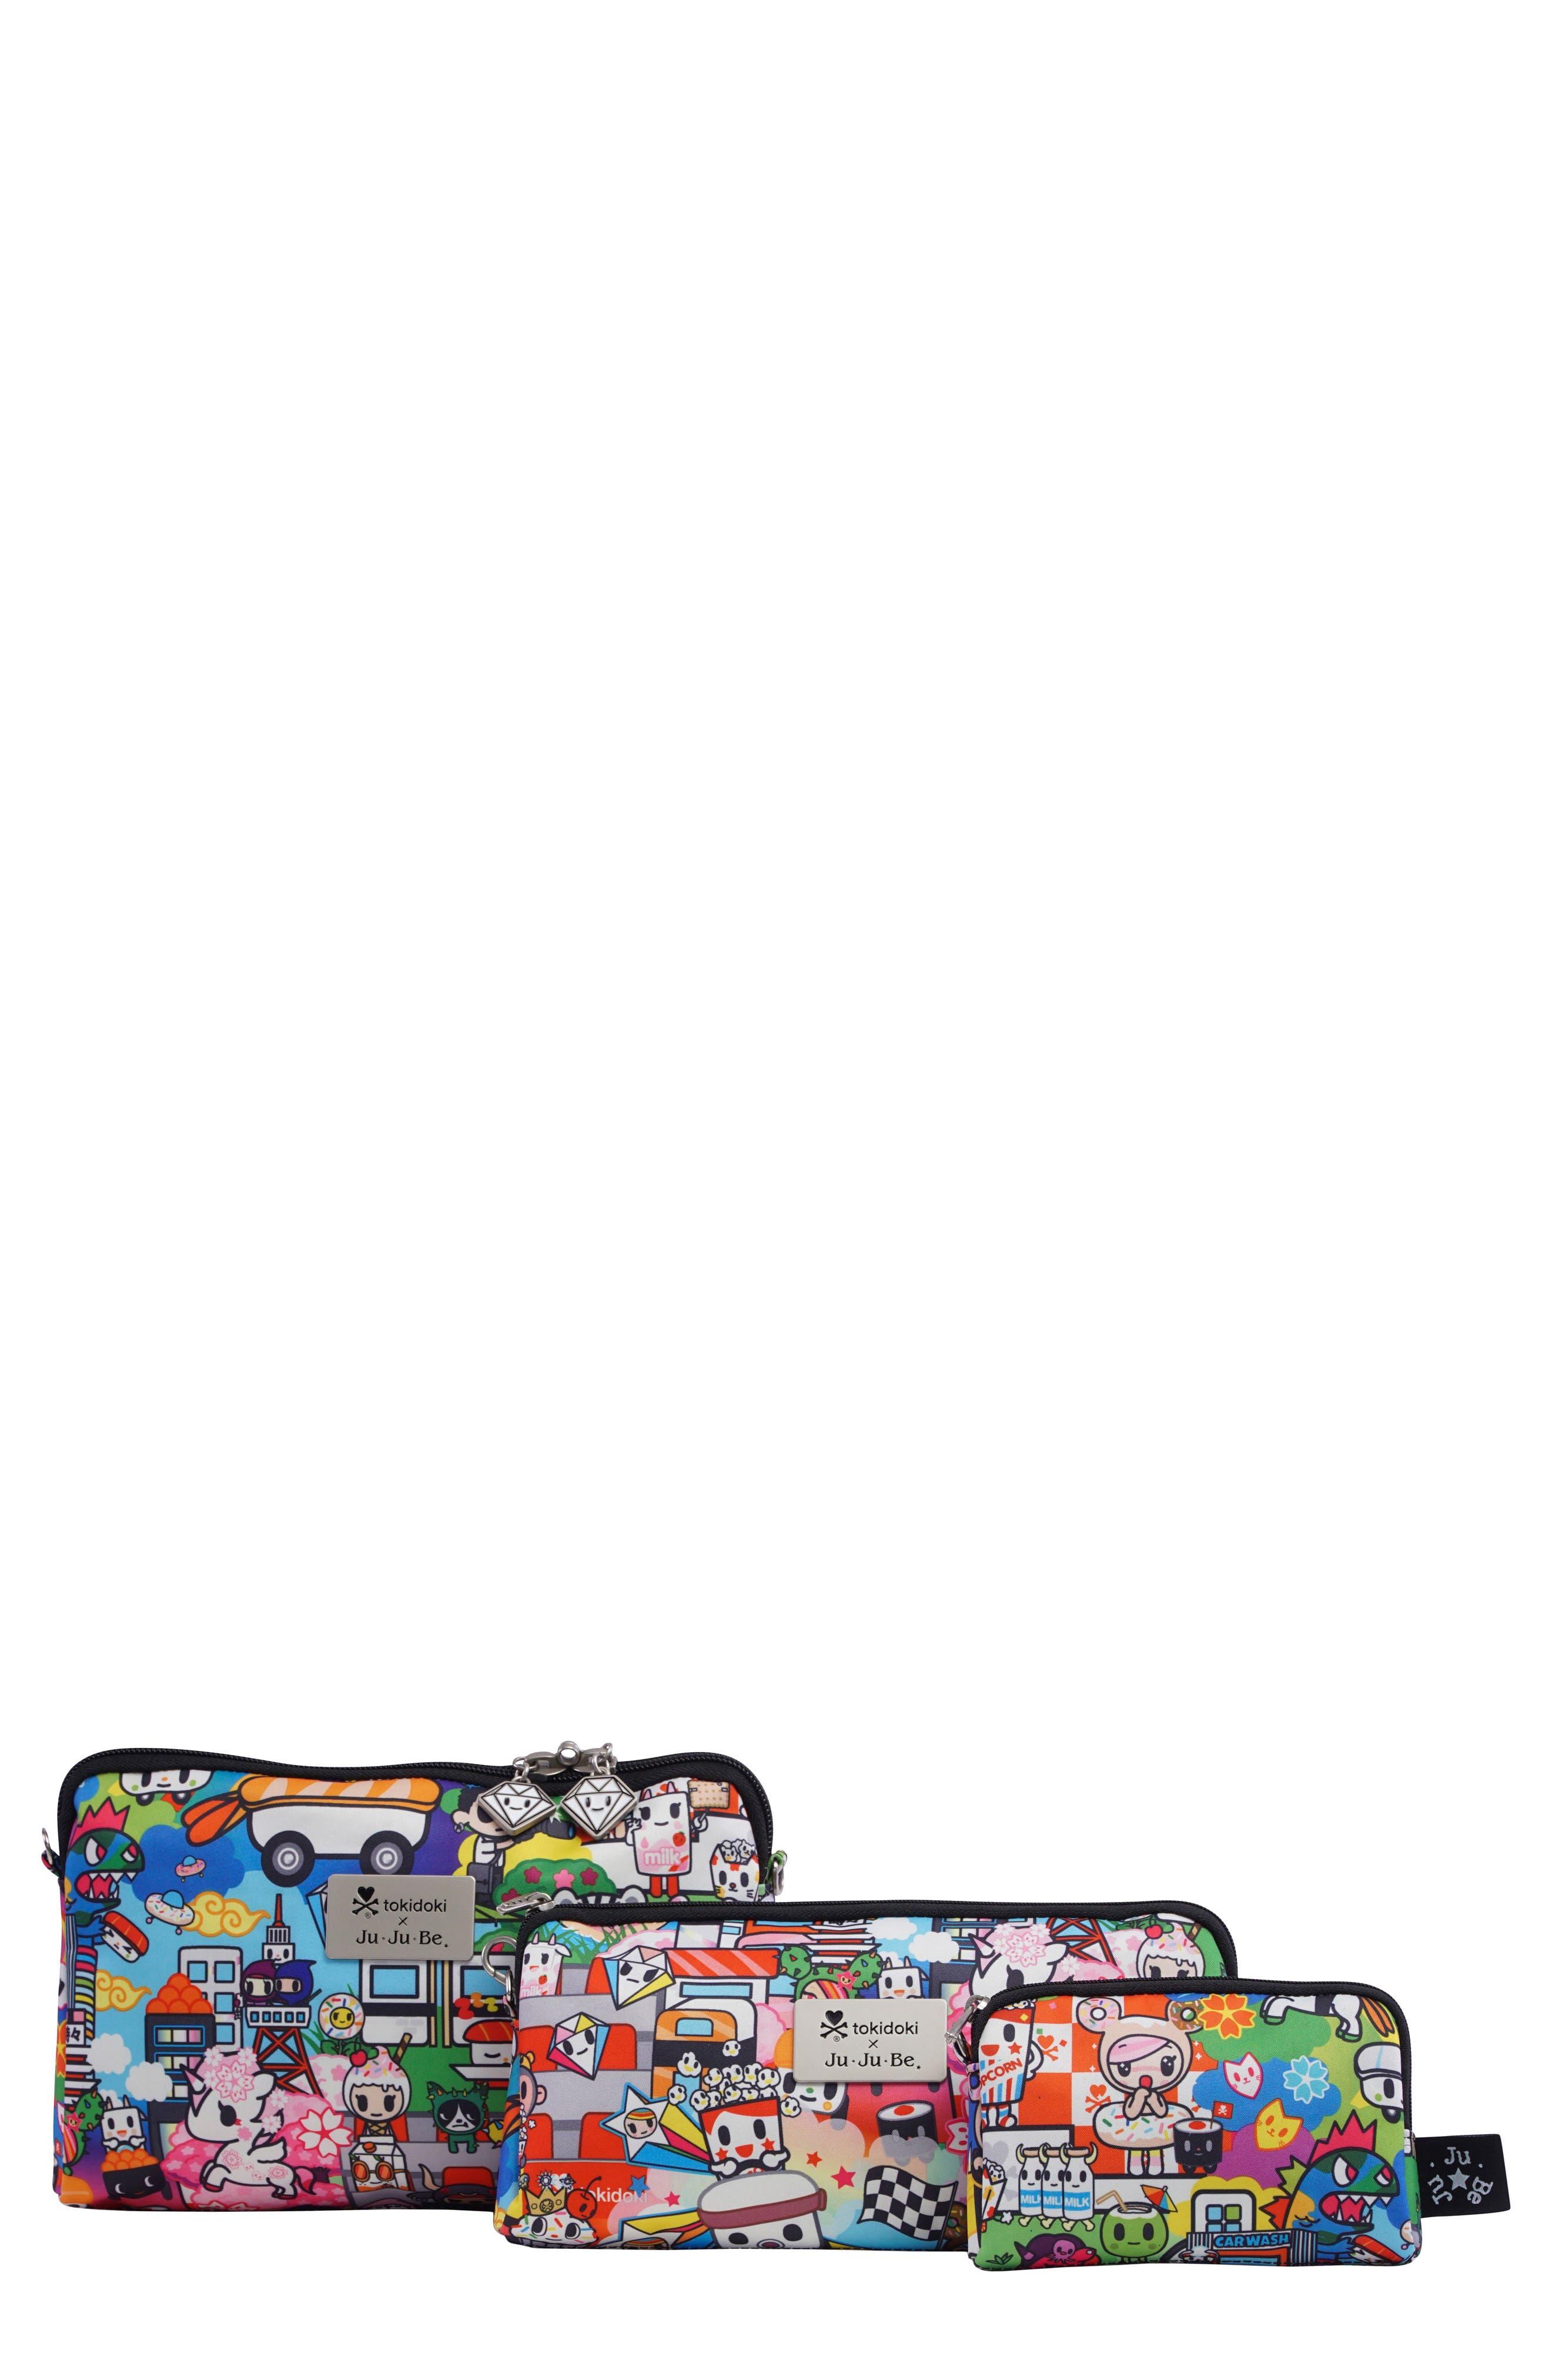 'Be Set' Top Zip Cases,                             Main thumbnail 1, color,                             Sushi Cars